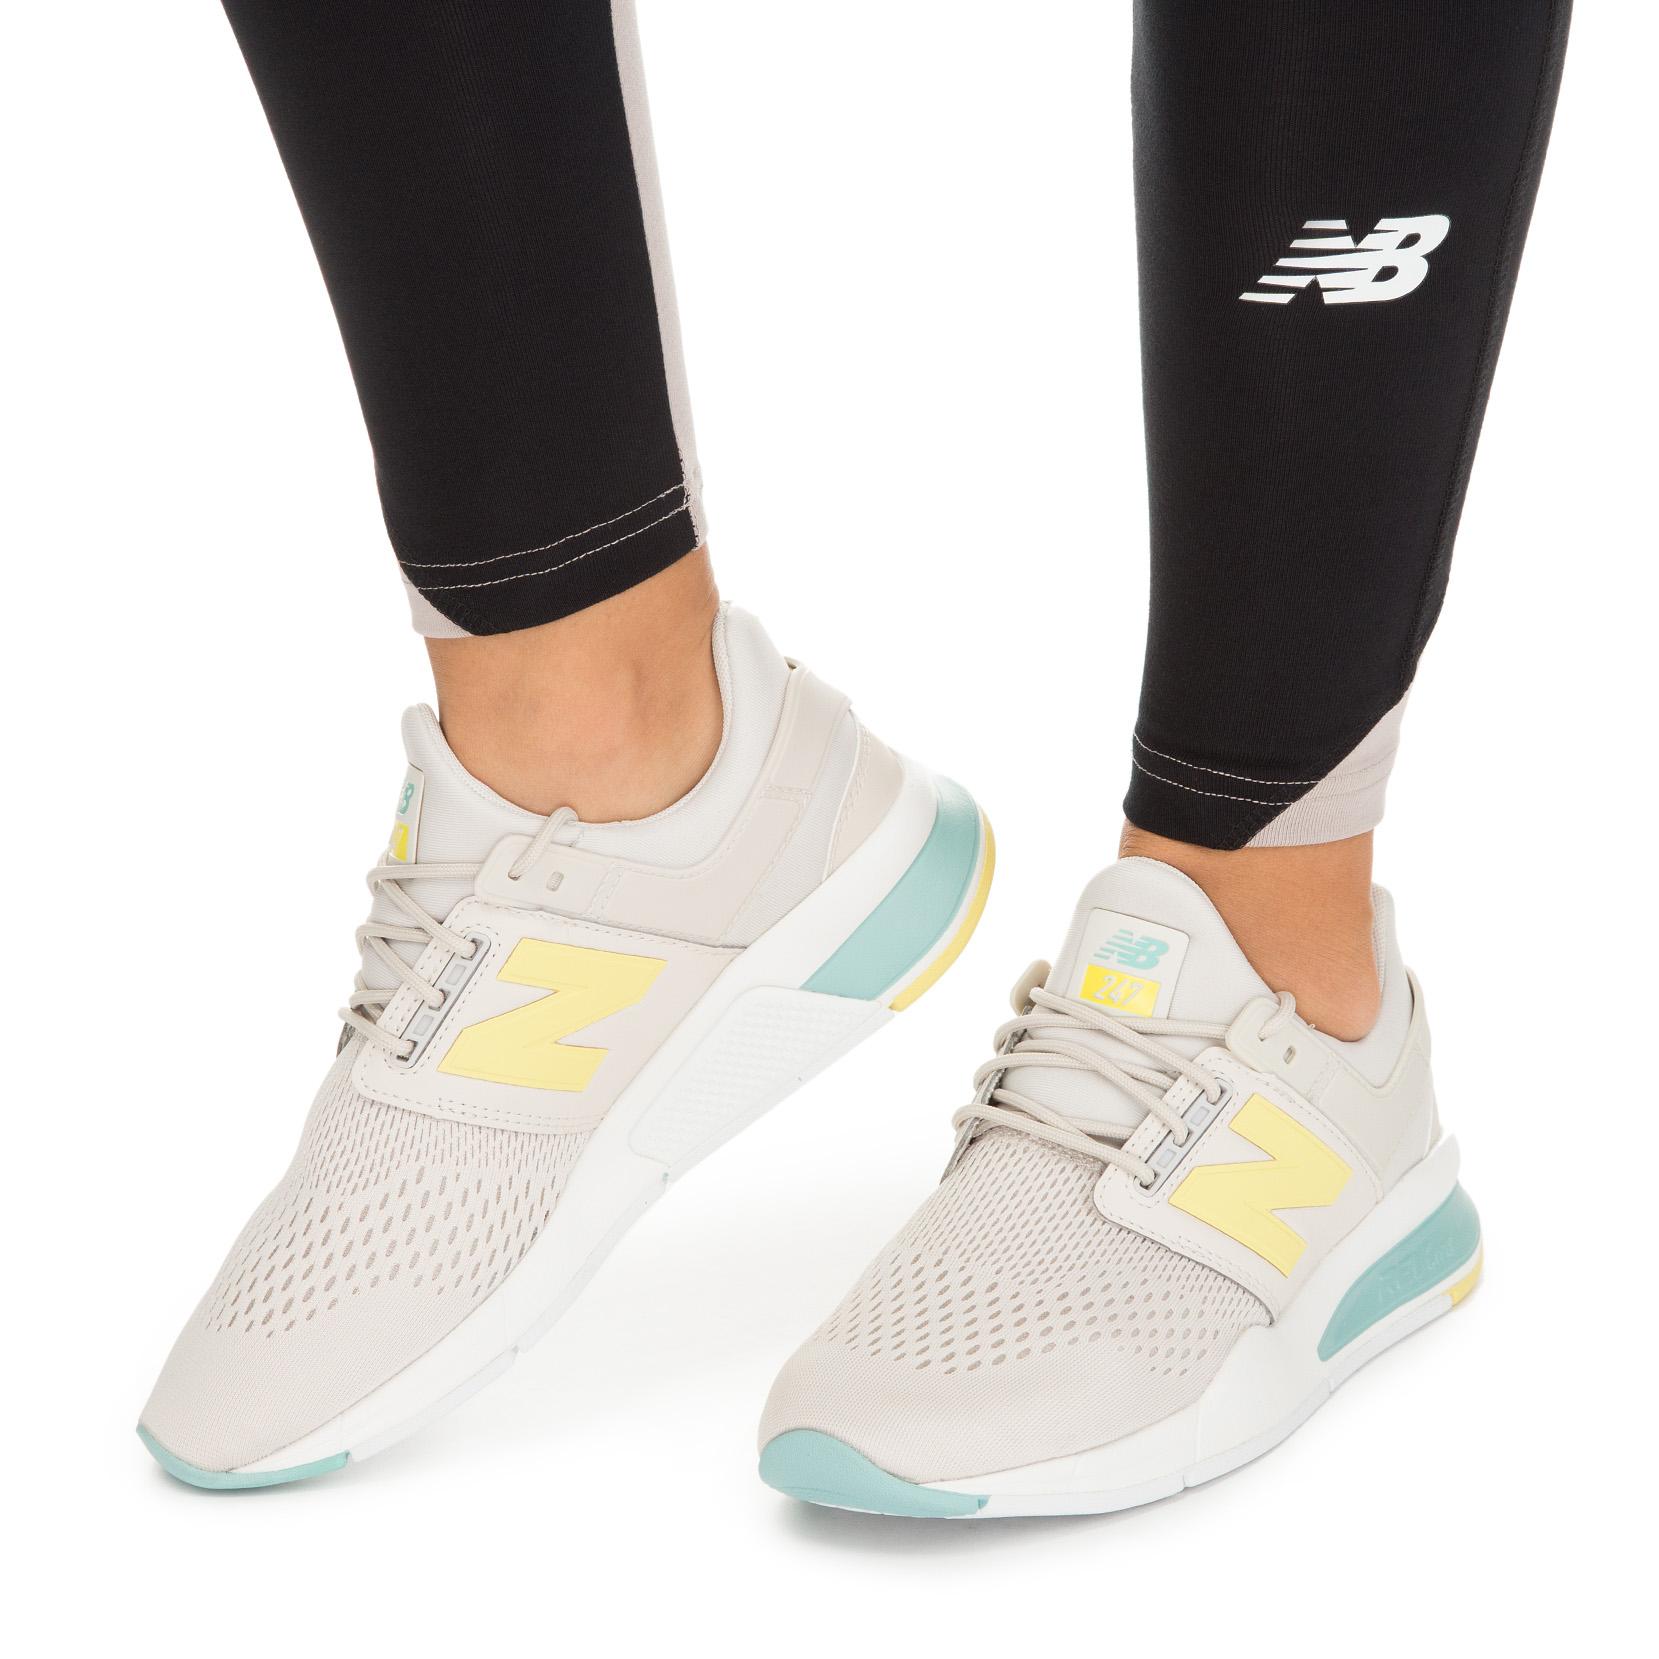 Жіноче взуття повсякденне New Balance 247 Tritium WS247FE | New Balance